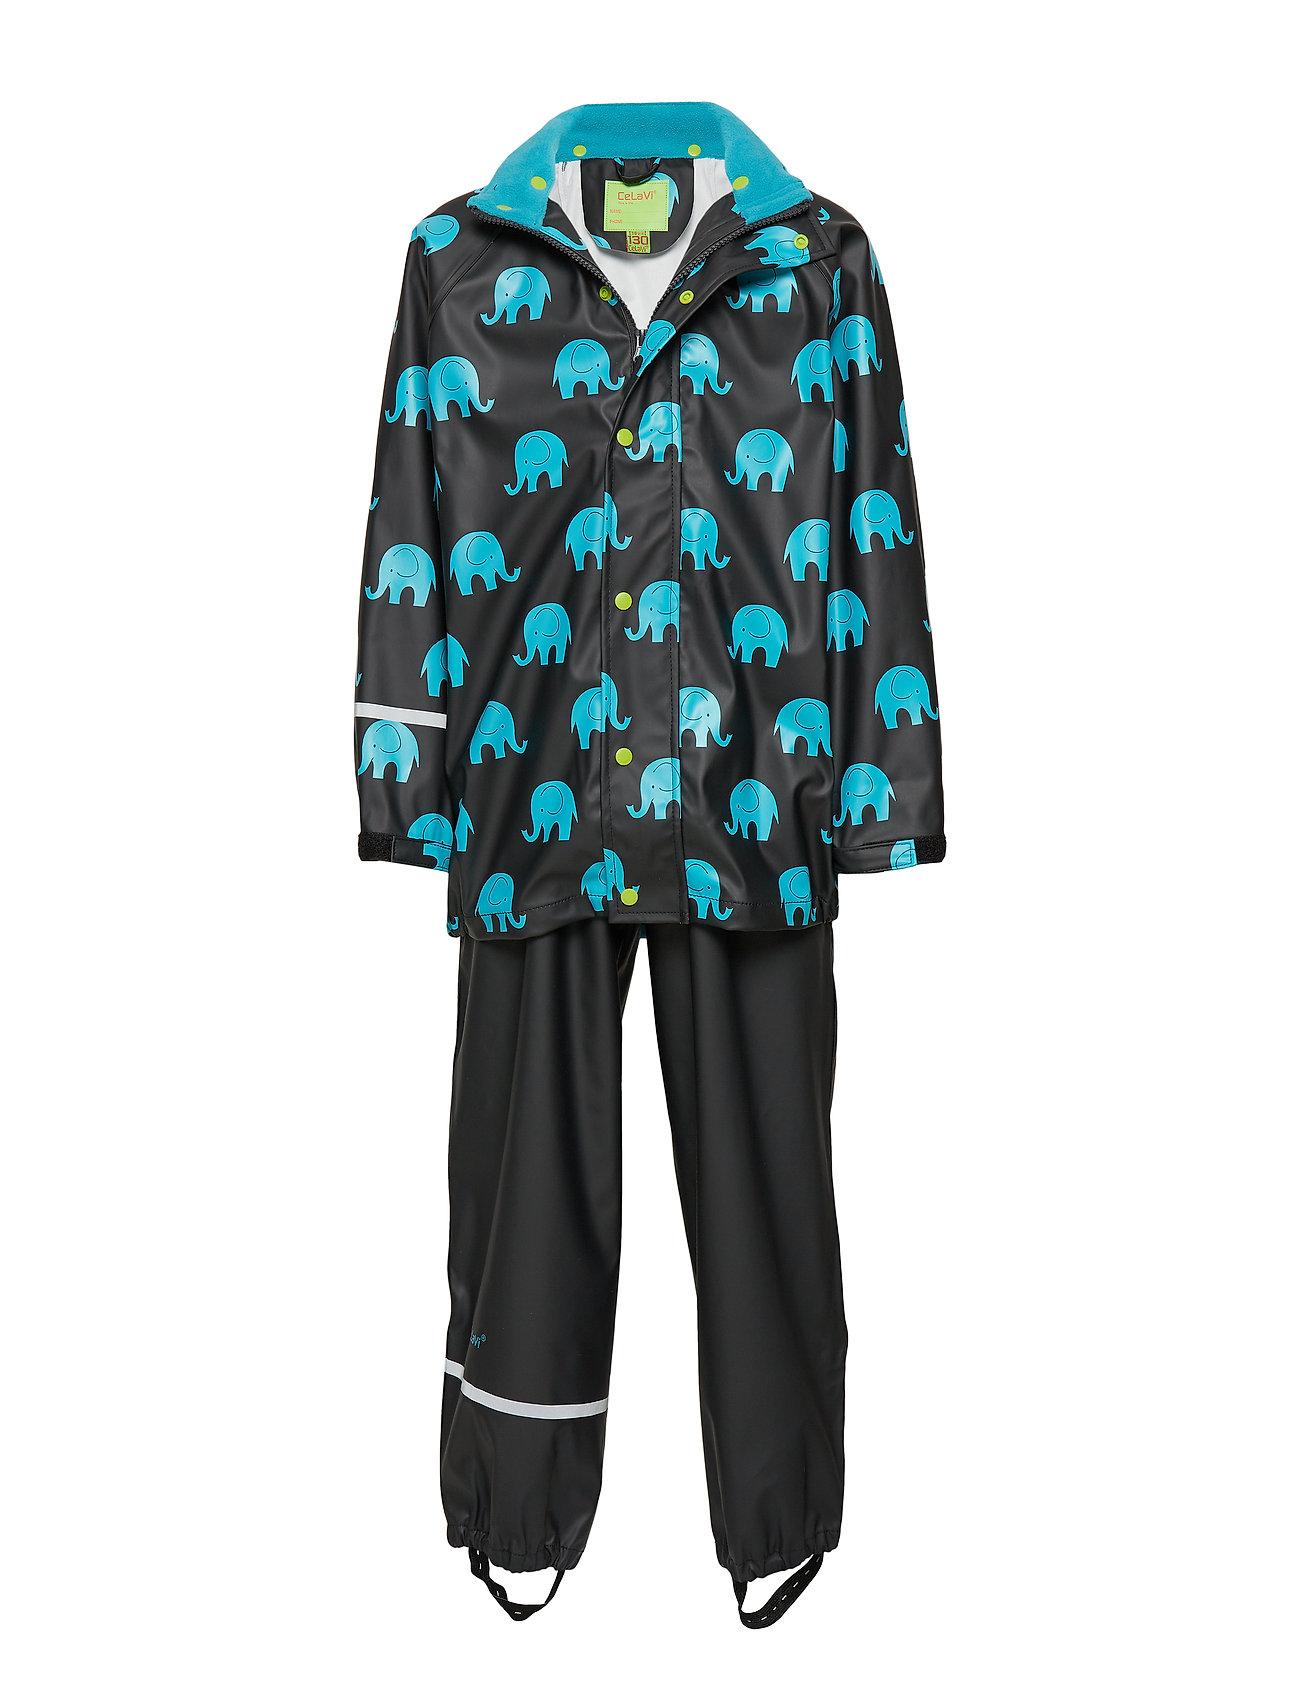 CeLaVi Rainwear set w. elepant print - BLACK